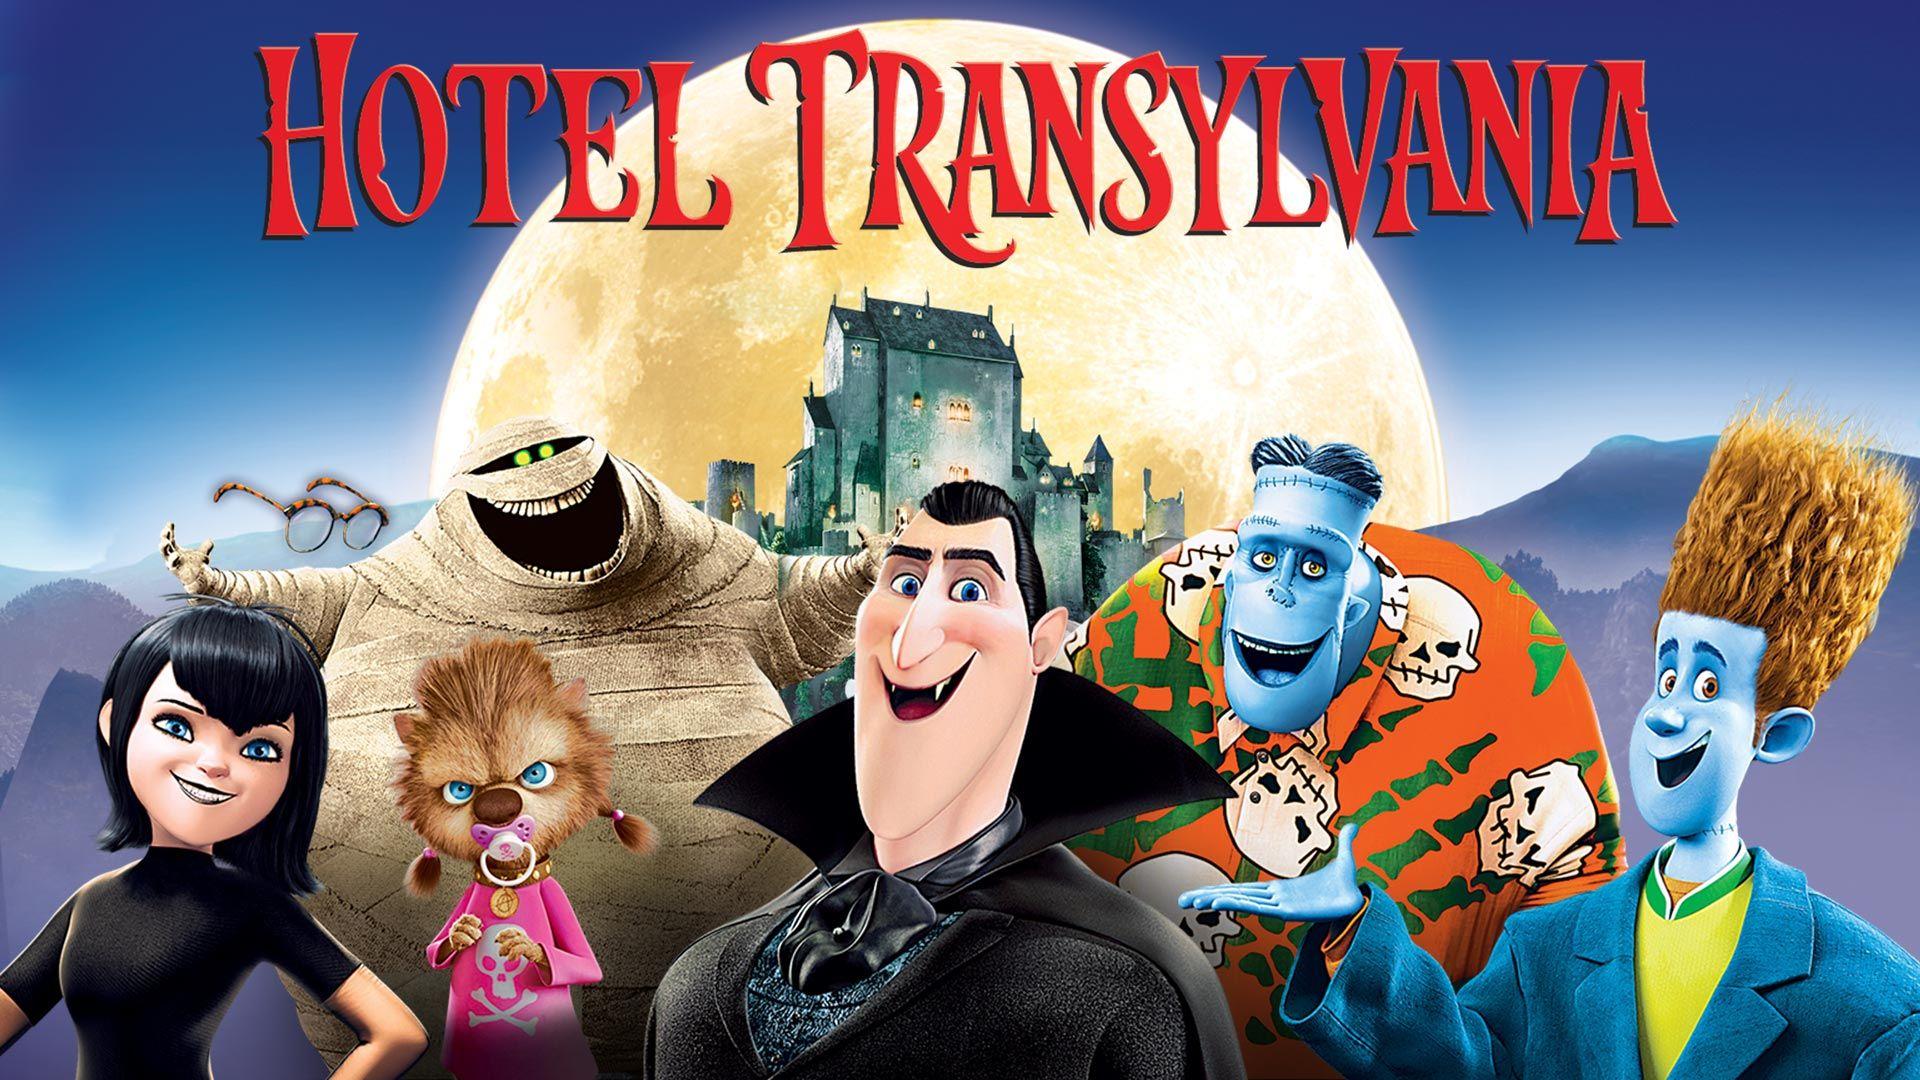 Hotel Transylvania